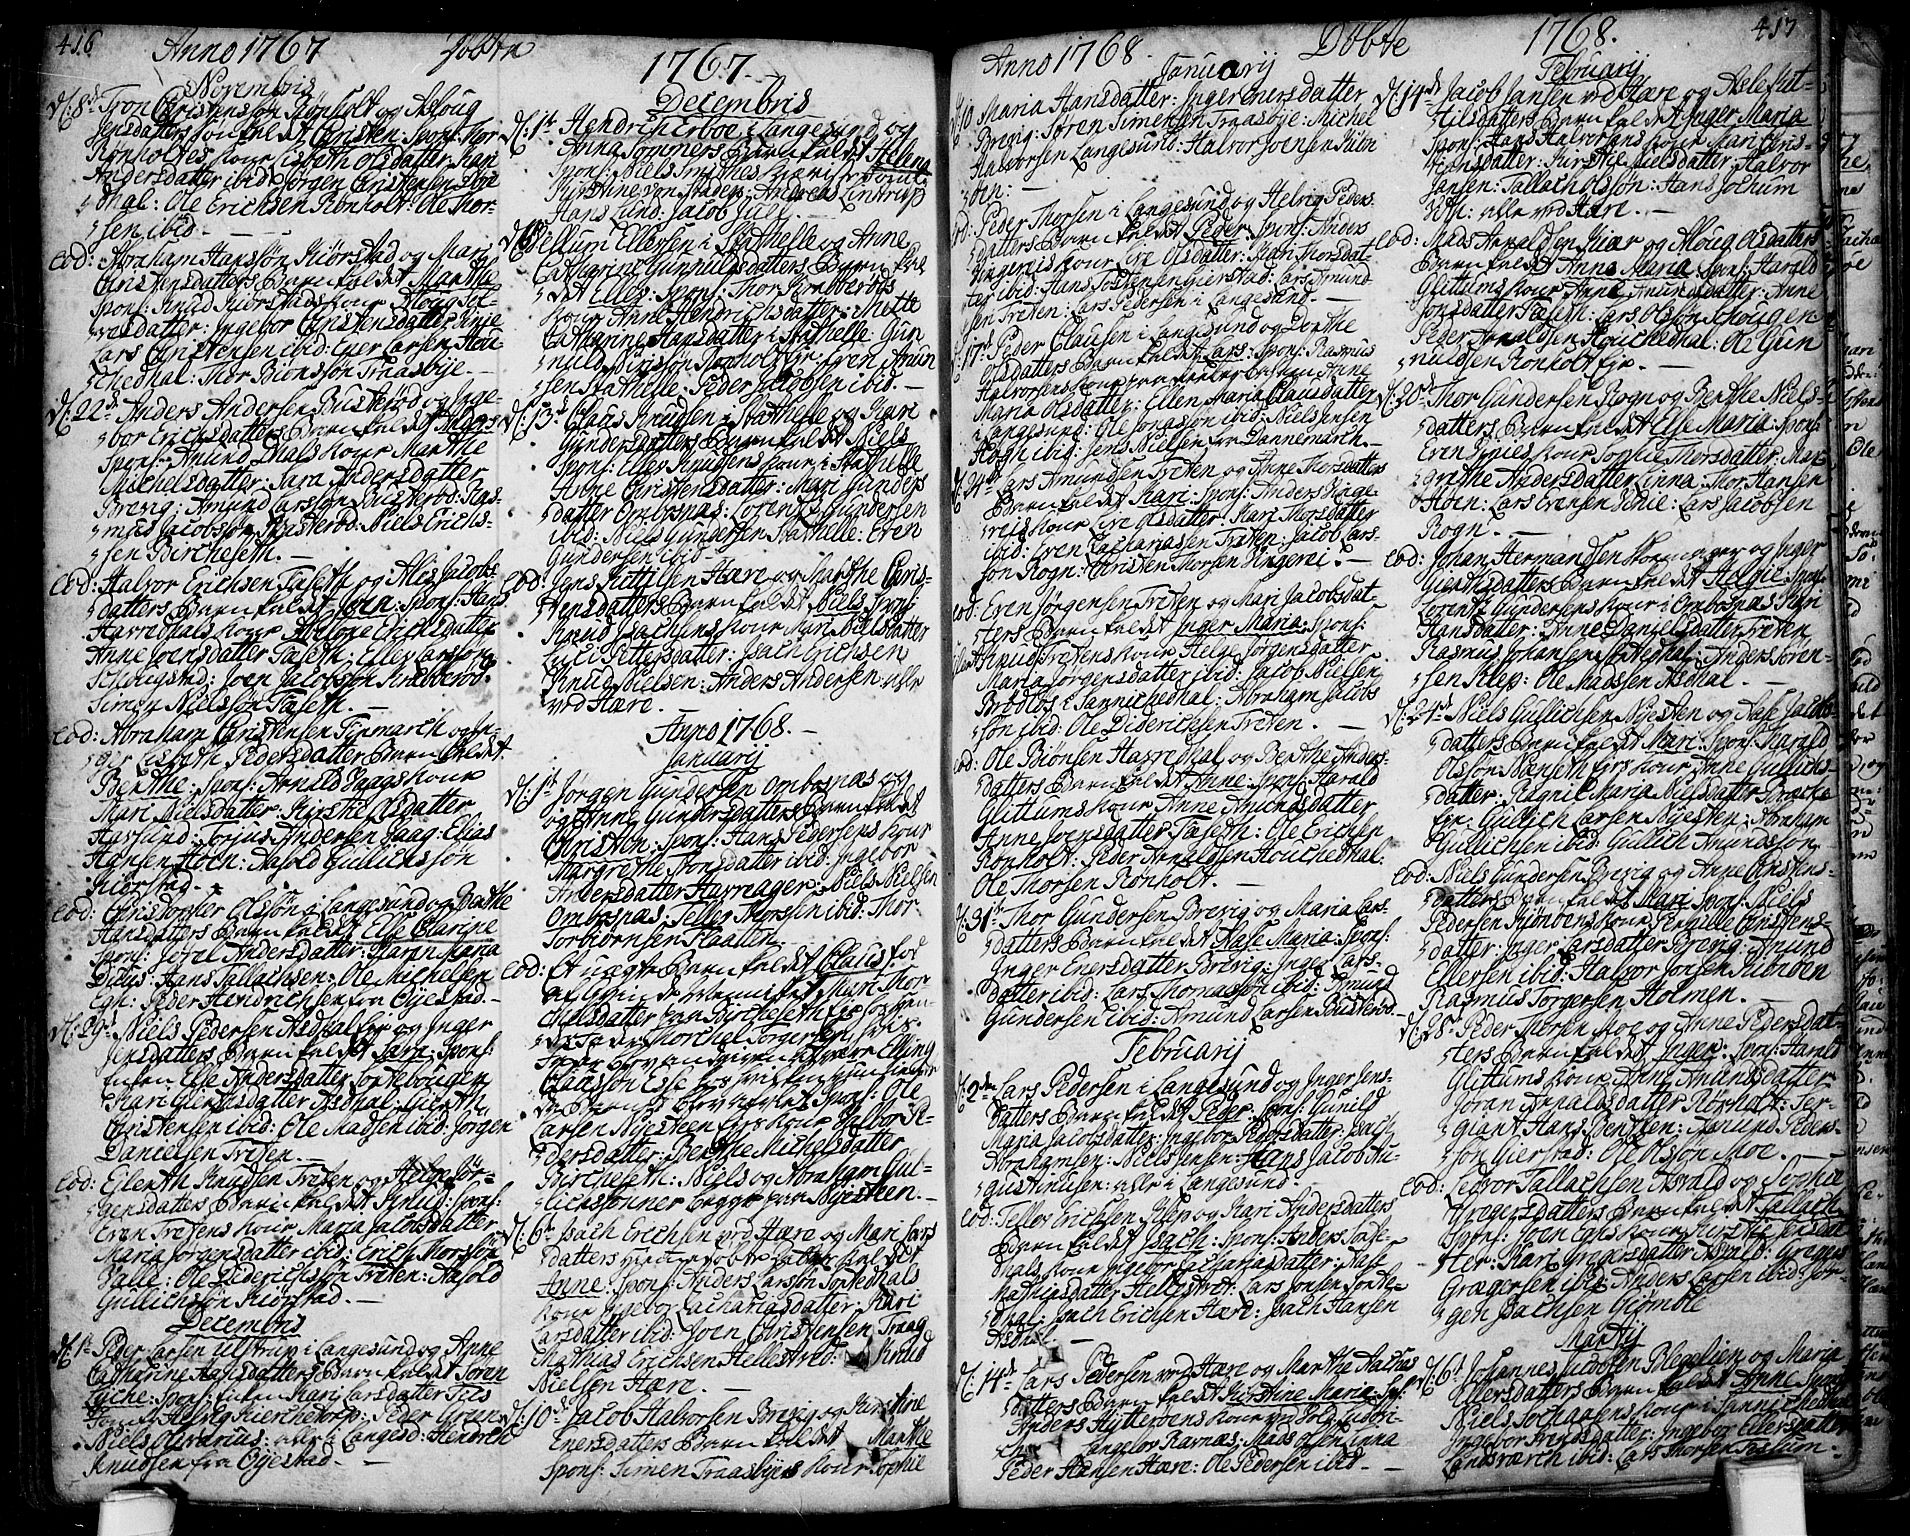 SAKO, Bamble kirkebøker, F/Fa/L0001: Ministerialbok nr. I 1, 1702-1774, s. 416-417